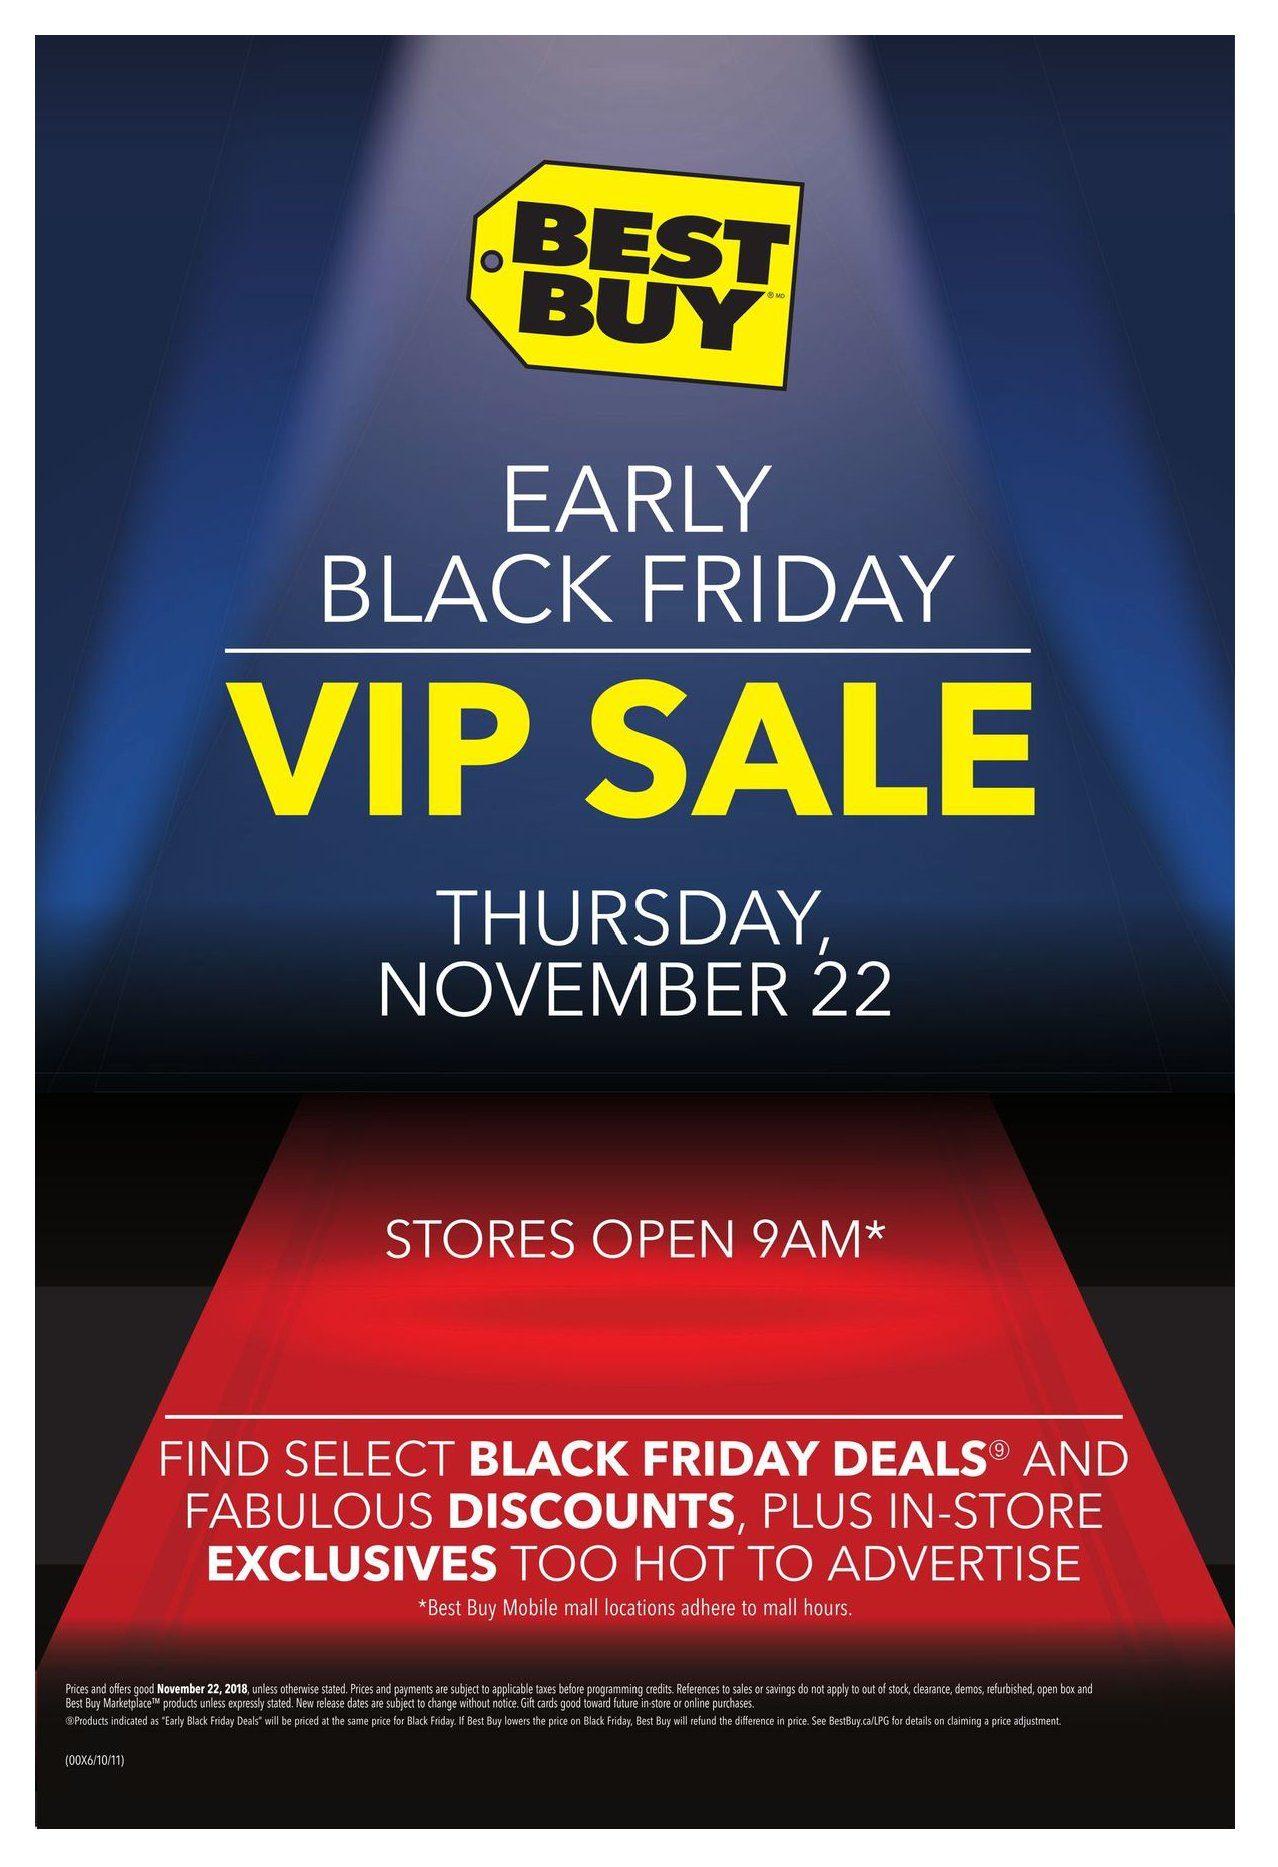 ca6ec65bdbb6 Best Buy Weekly Flyer - Early Black Friday V.I.P. Sale - Nov 22 – 22 -  RedFlagDeals.com